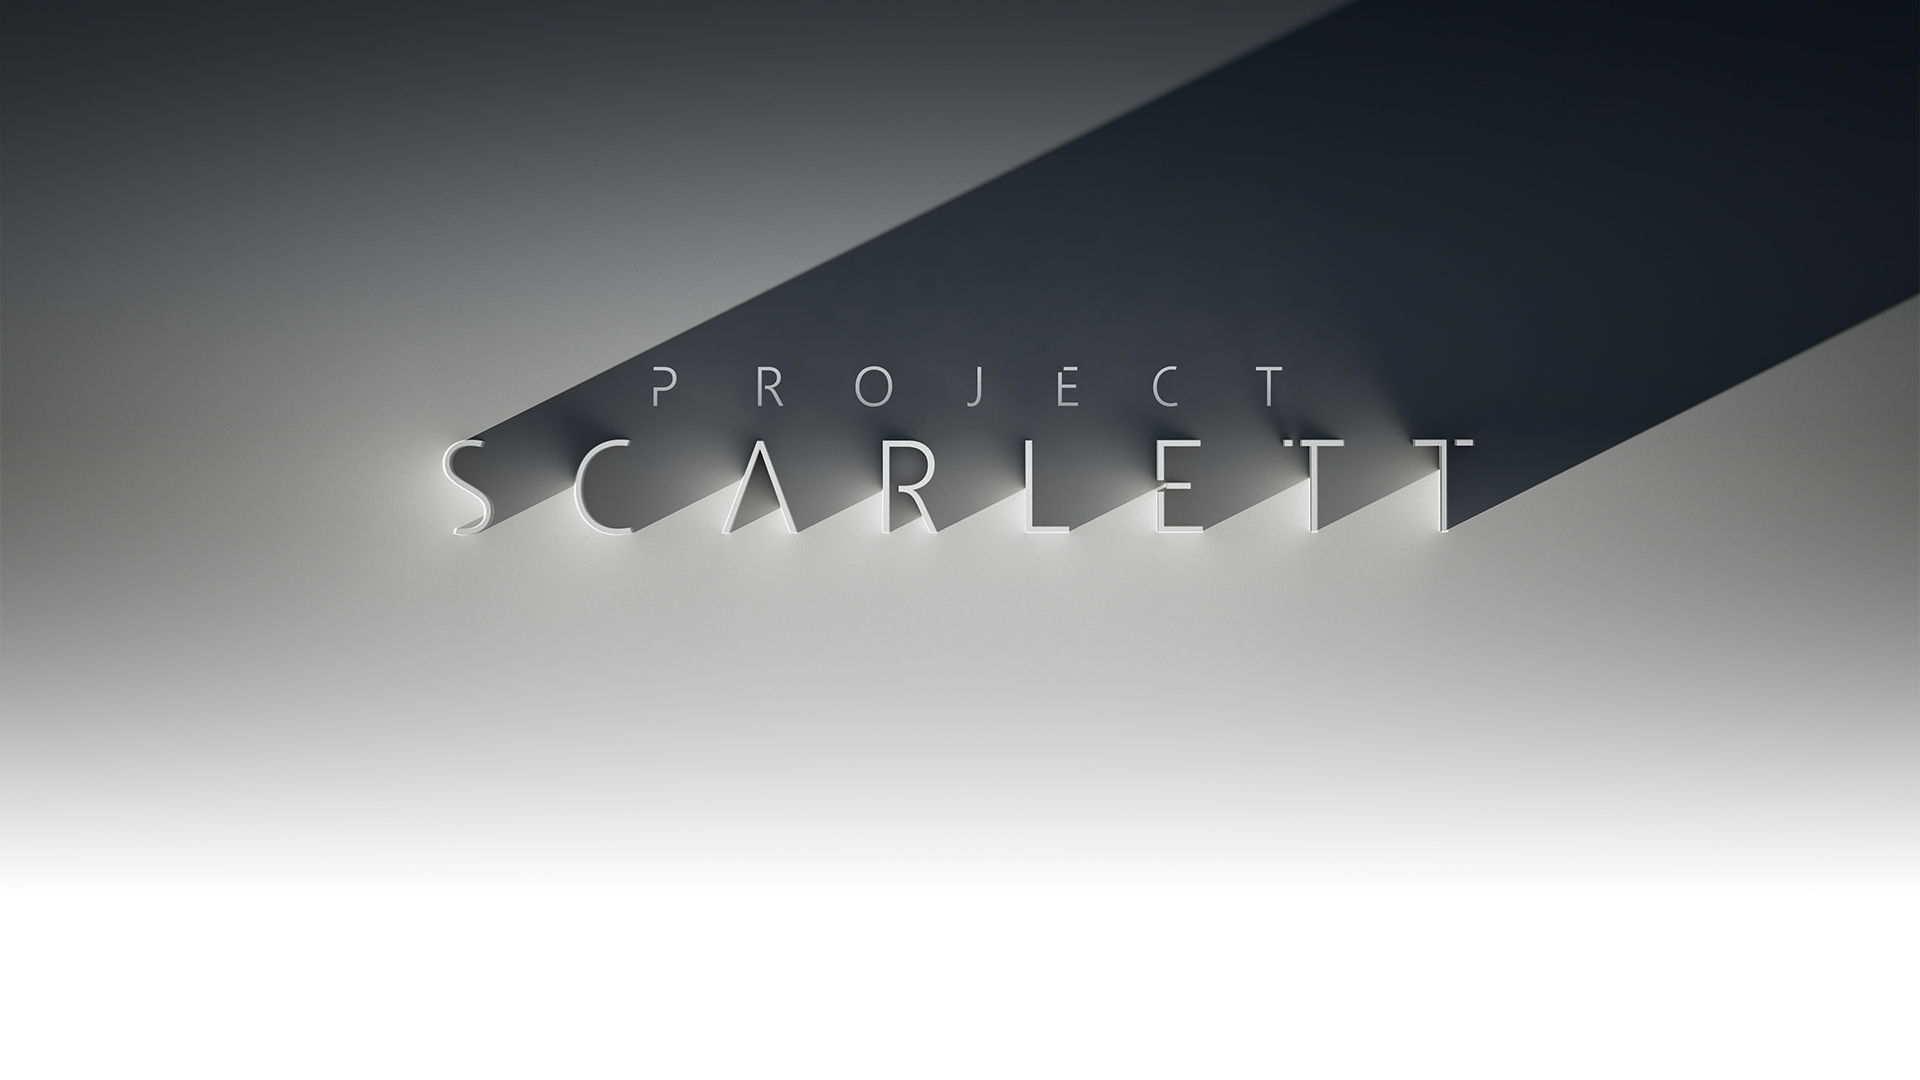 Project Scarlett, stylized three dimensional lettering cast in shadow